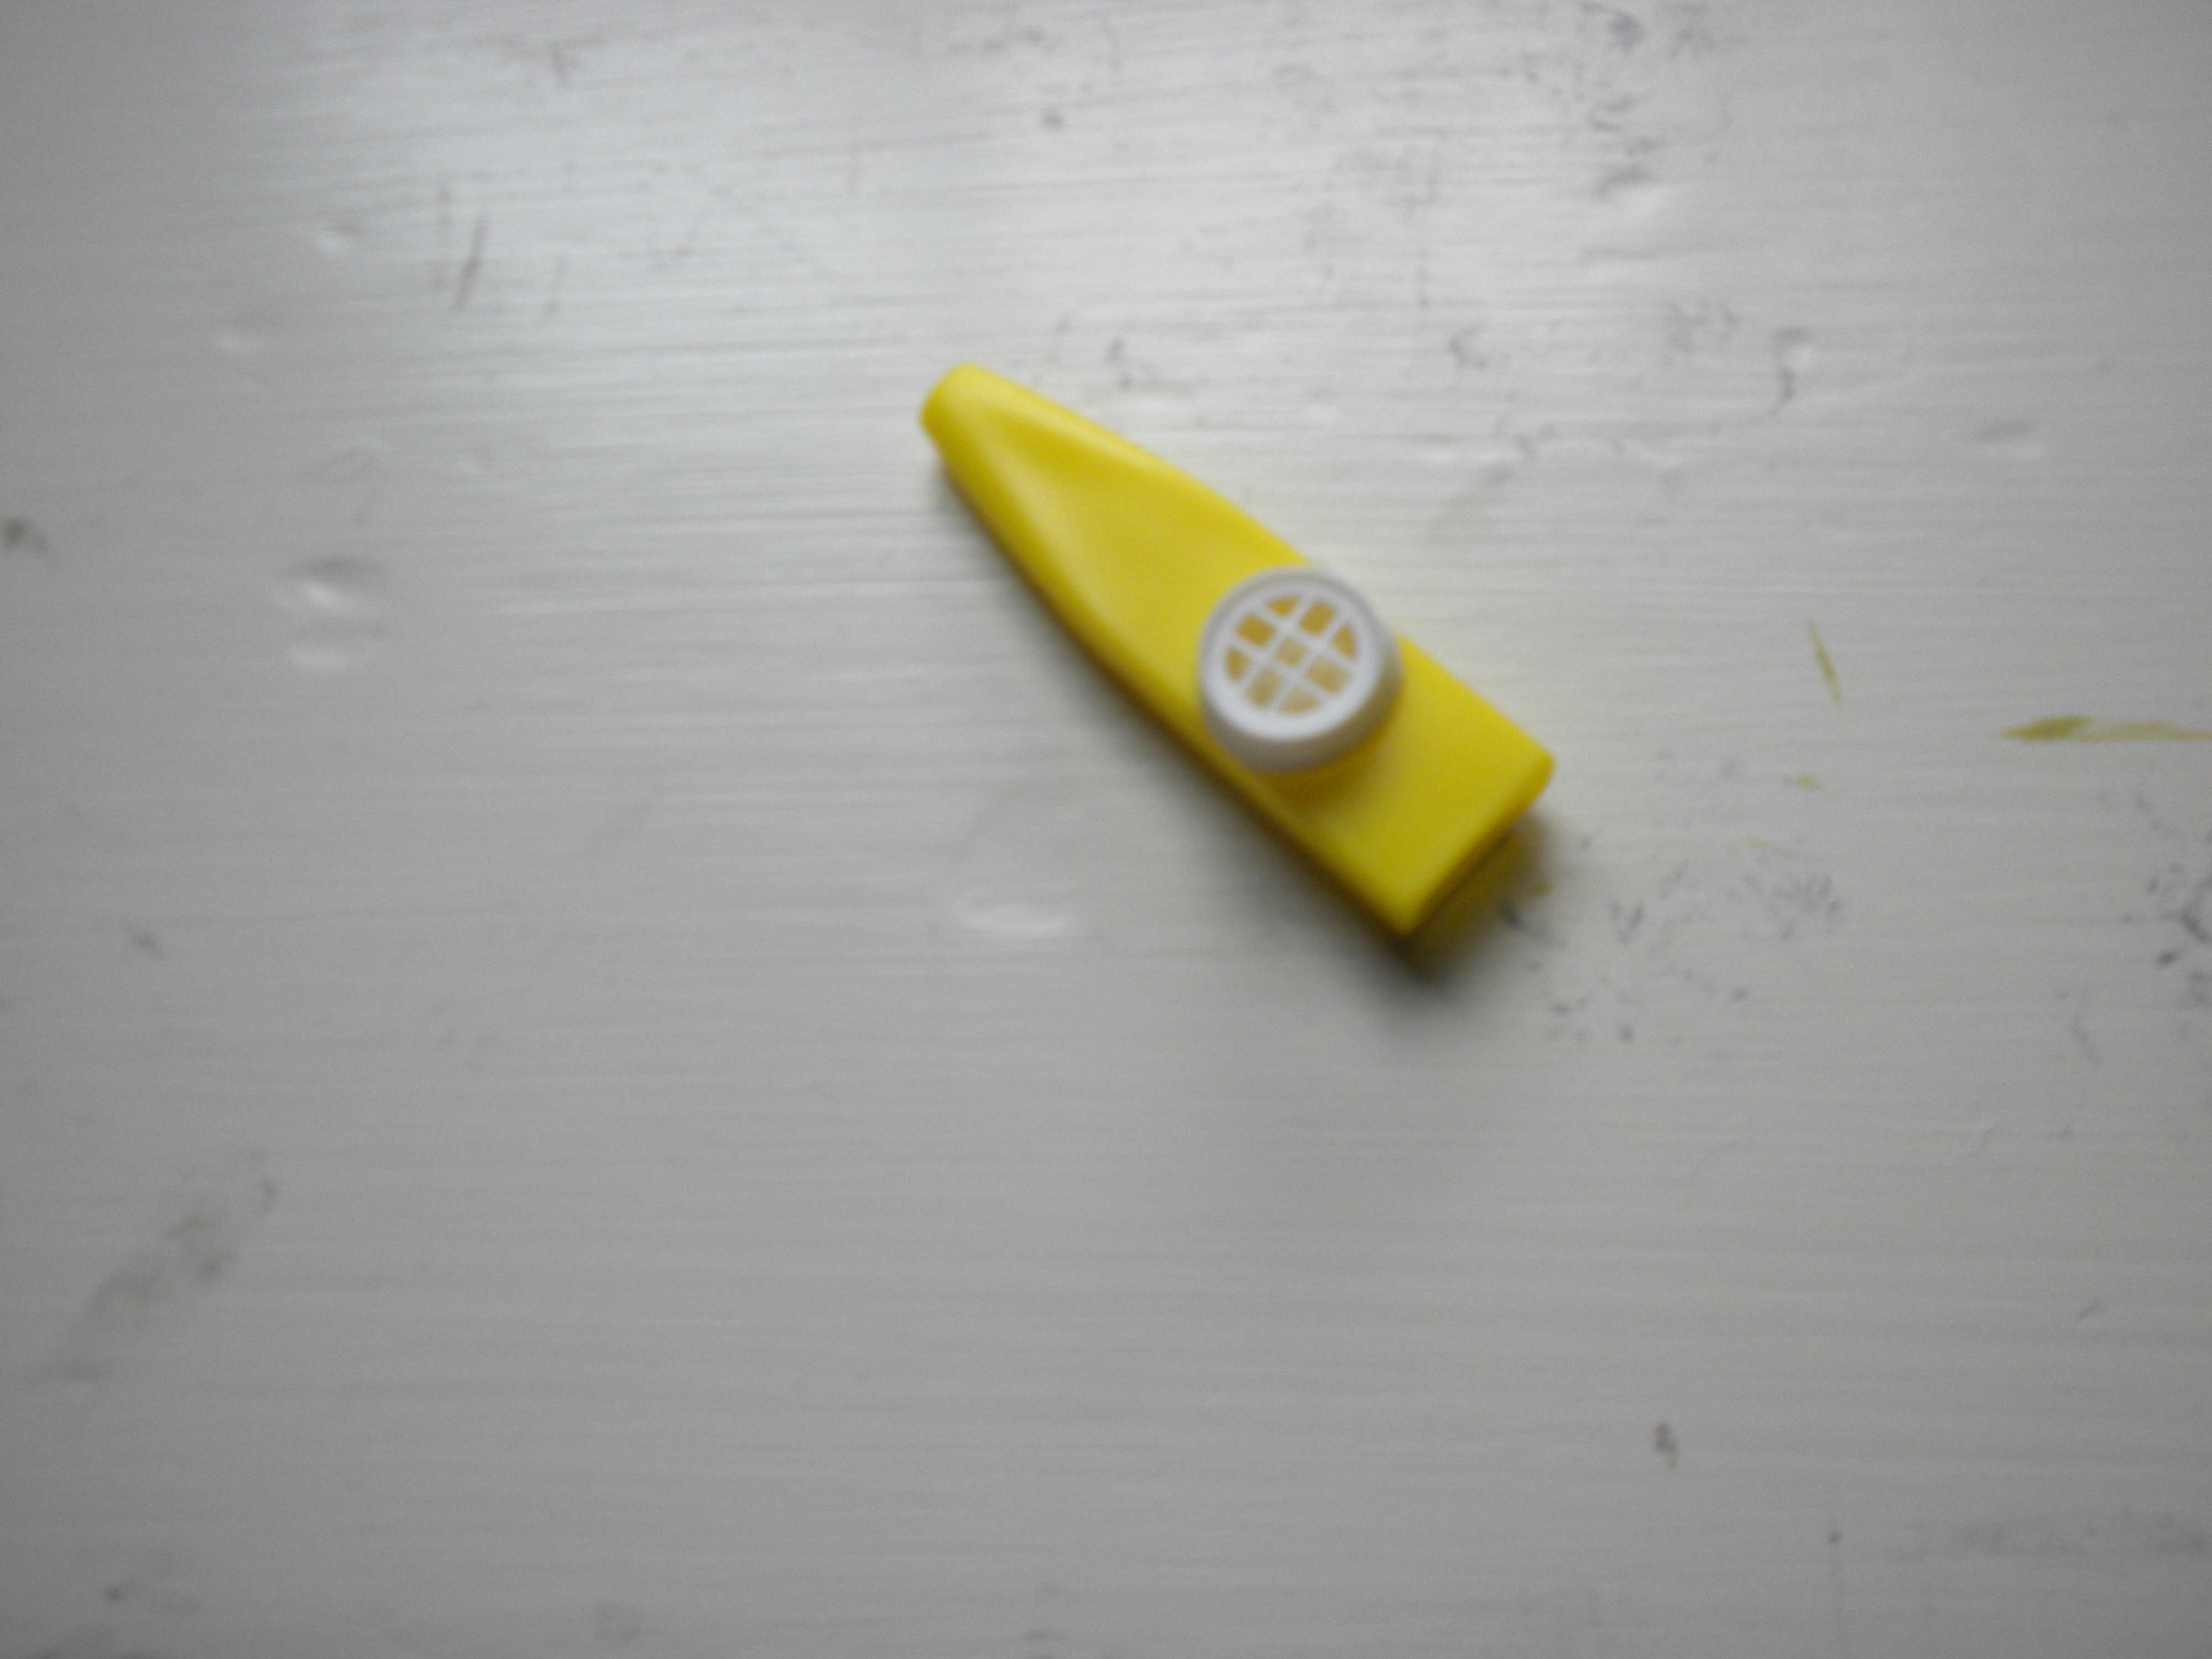 make a kazoo for $0.00